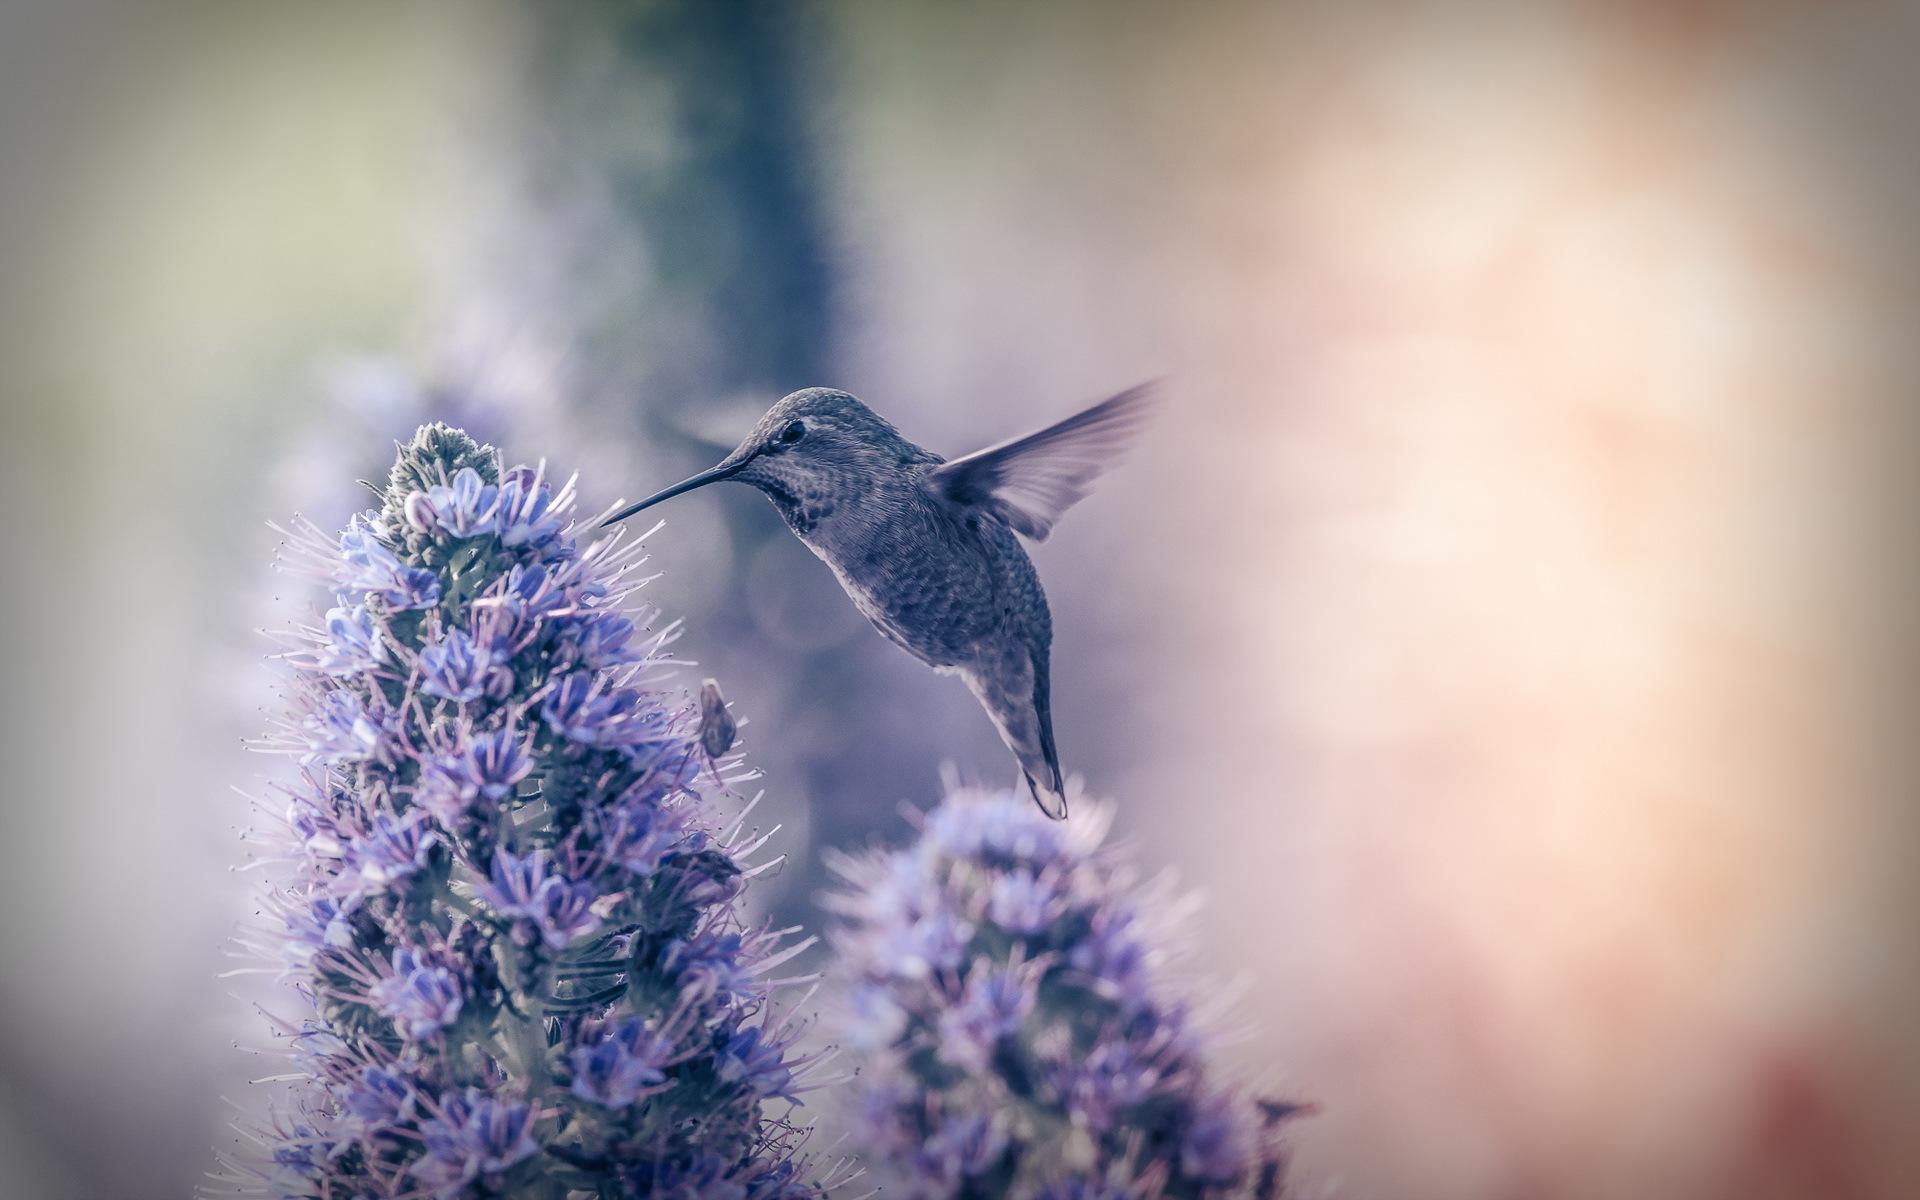 Hummingbird full hd wallpaper and background image - Animal and bird hd wallpaper ...